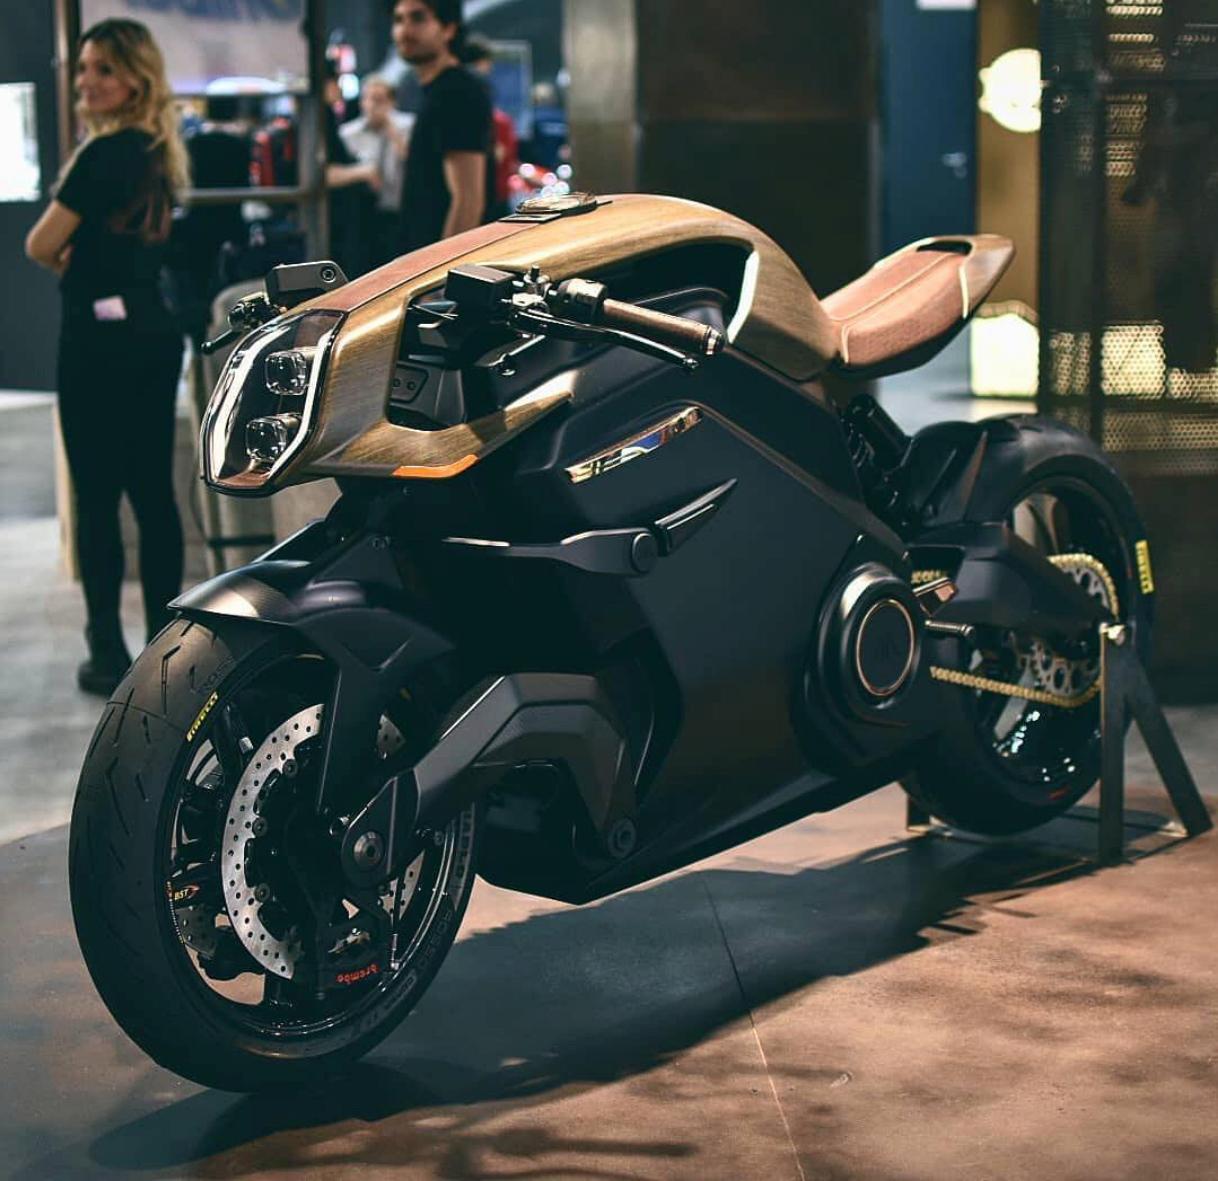 Motos Zéro CO2 : mission One, motoCzysz, mission R ... - Page 7 99671810